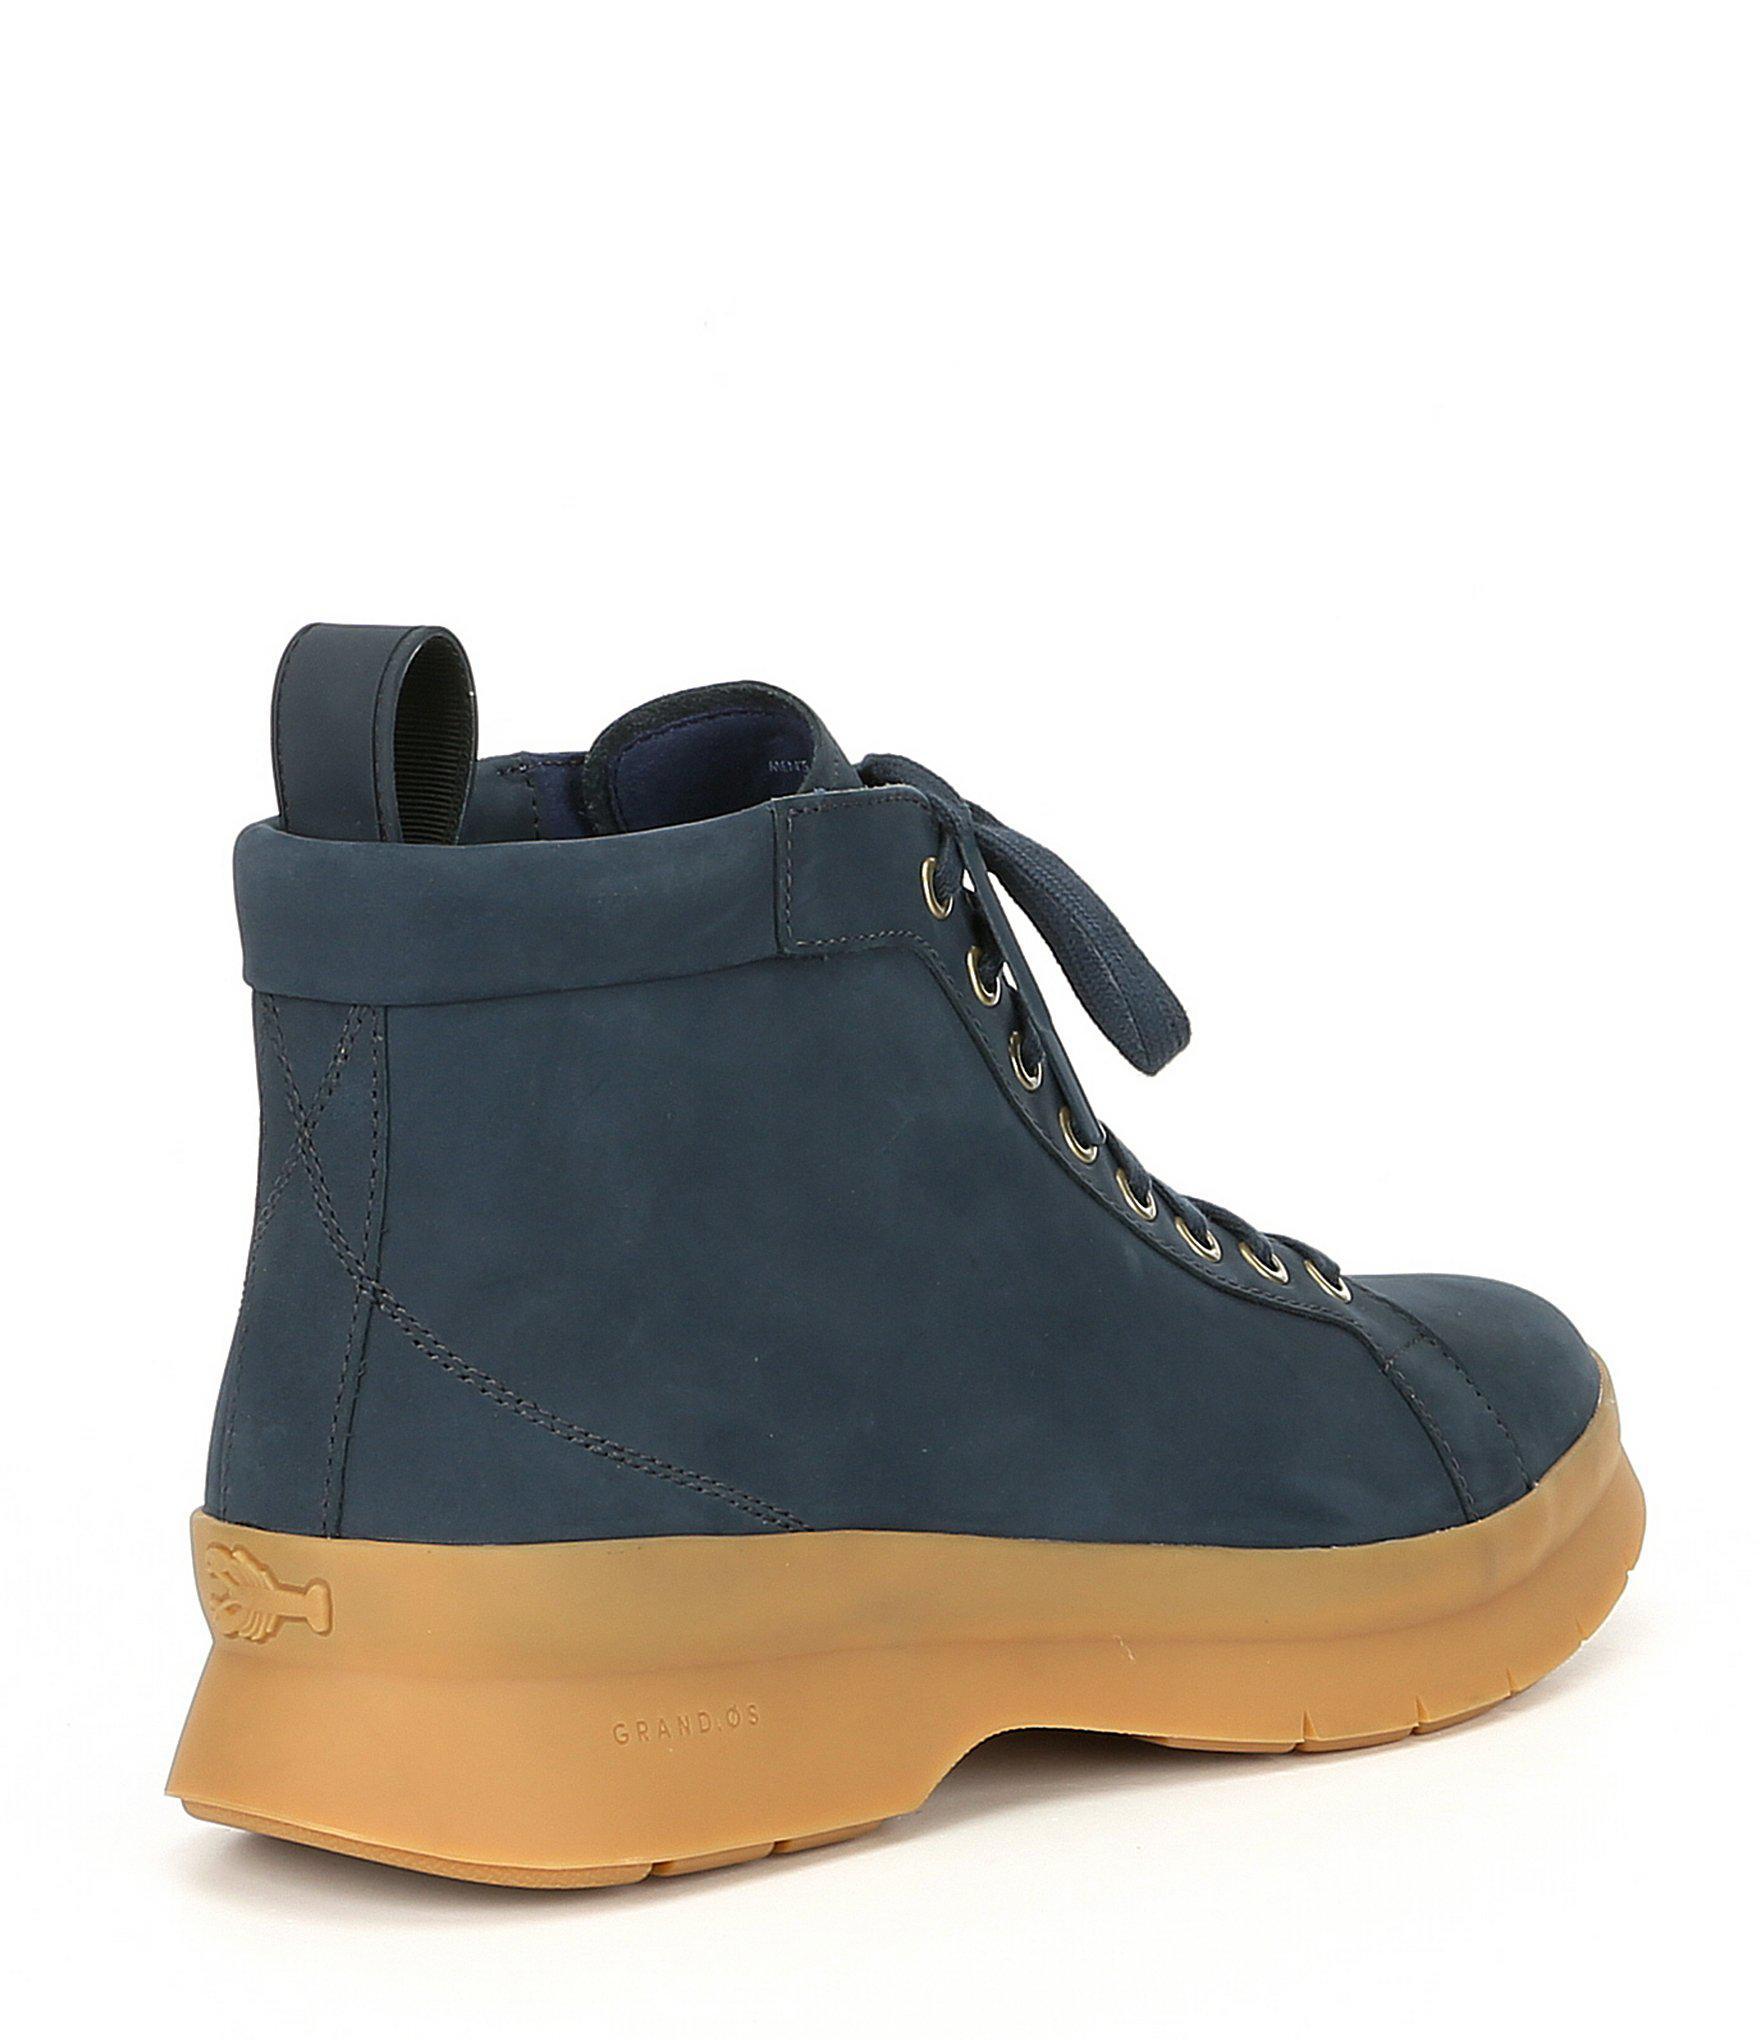 380b79c11e0 Lyst - Cole Haan Men s Pinch Utility Waterproof Chukka Boot in Blue ...